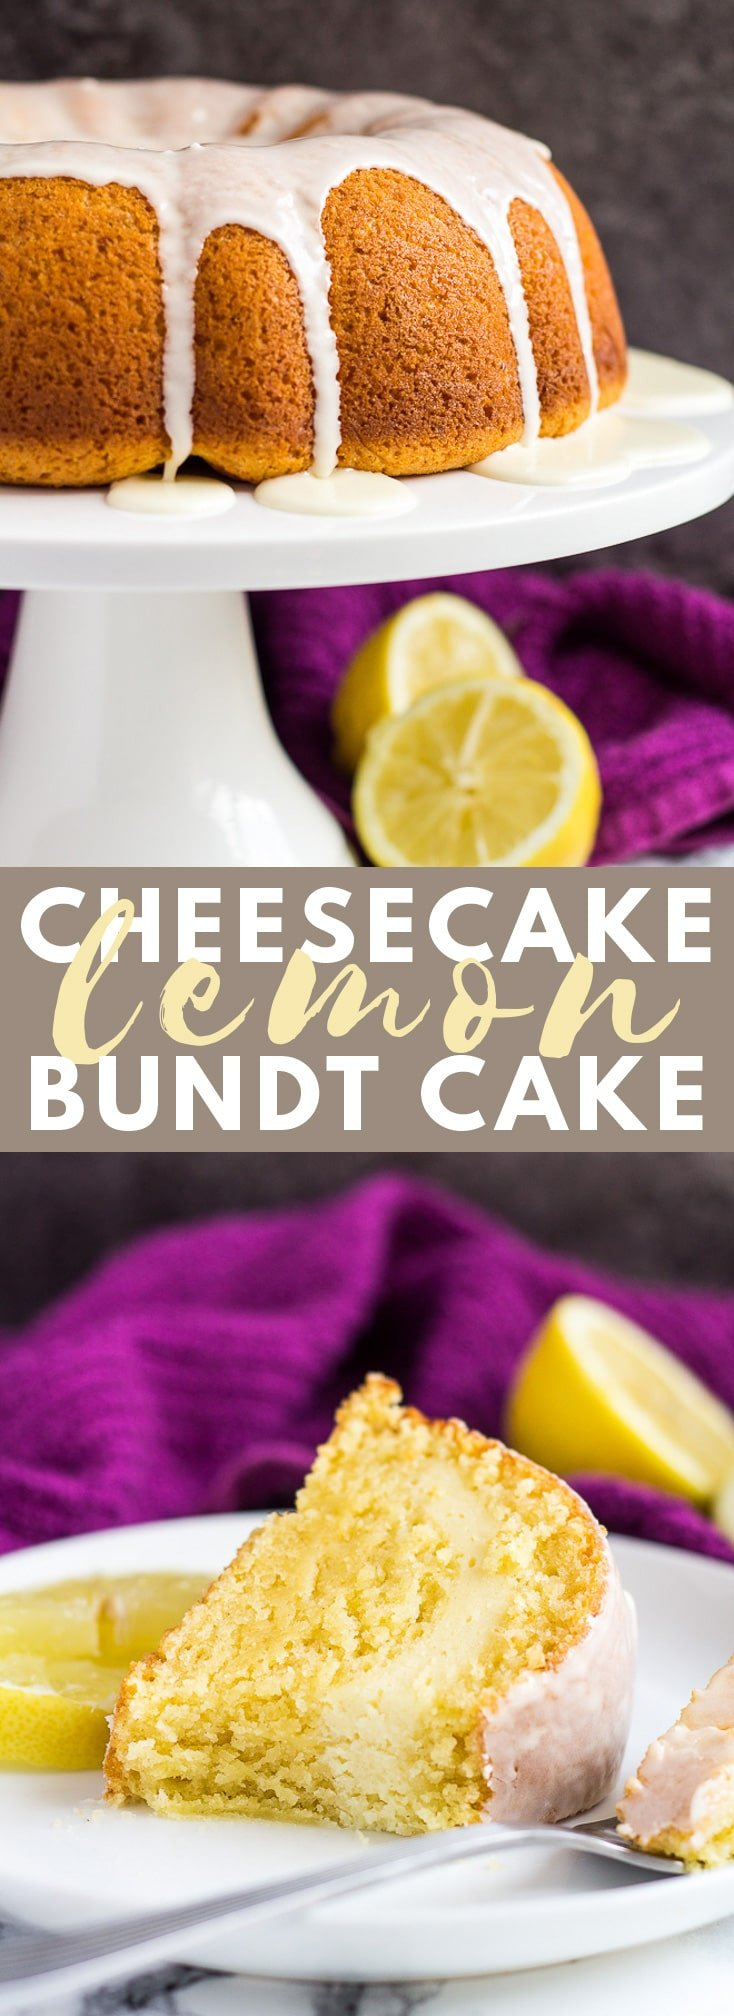 Cheesecake Swirl Lemon Bundt Cake - Deliciously moist and fluffy lemon-infused bundt cake, filled with a cheesecake swirl, and drizzled with a lemon glaze!